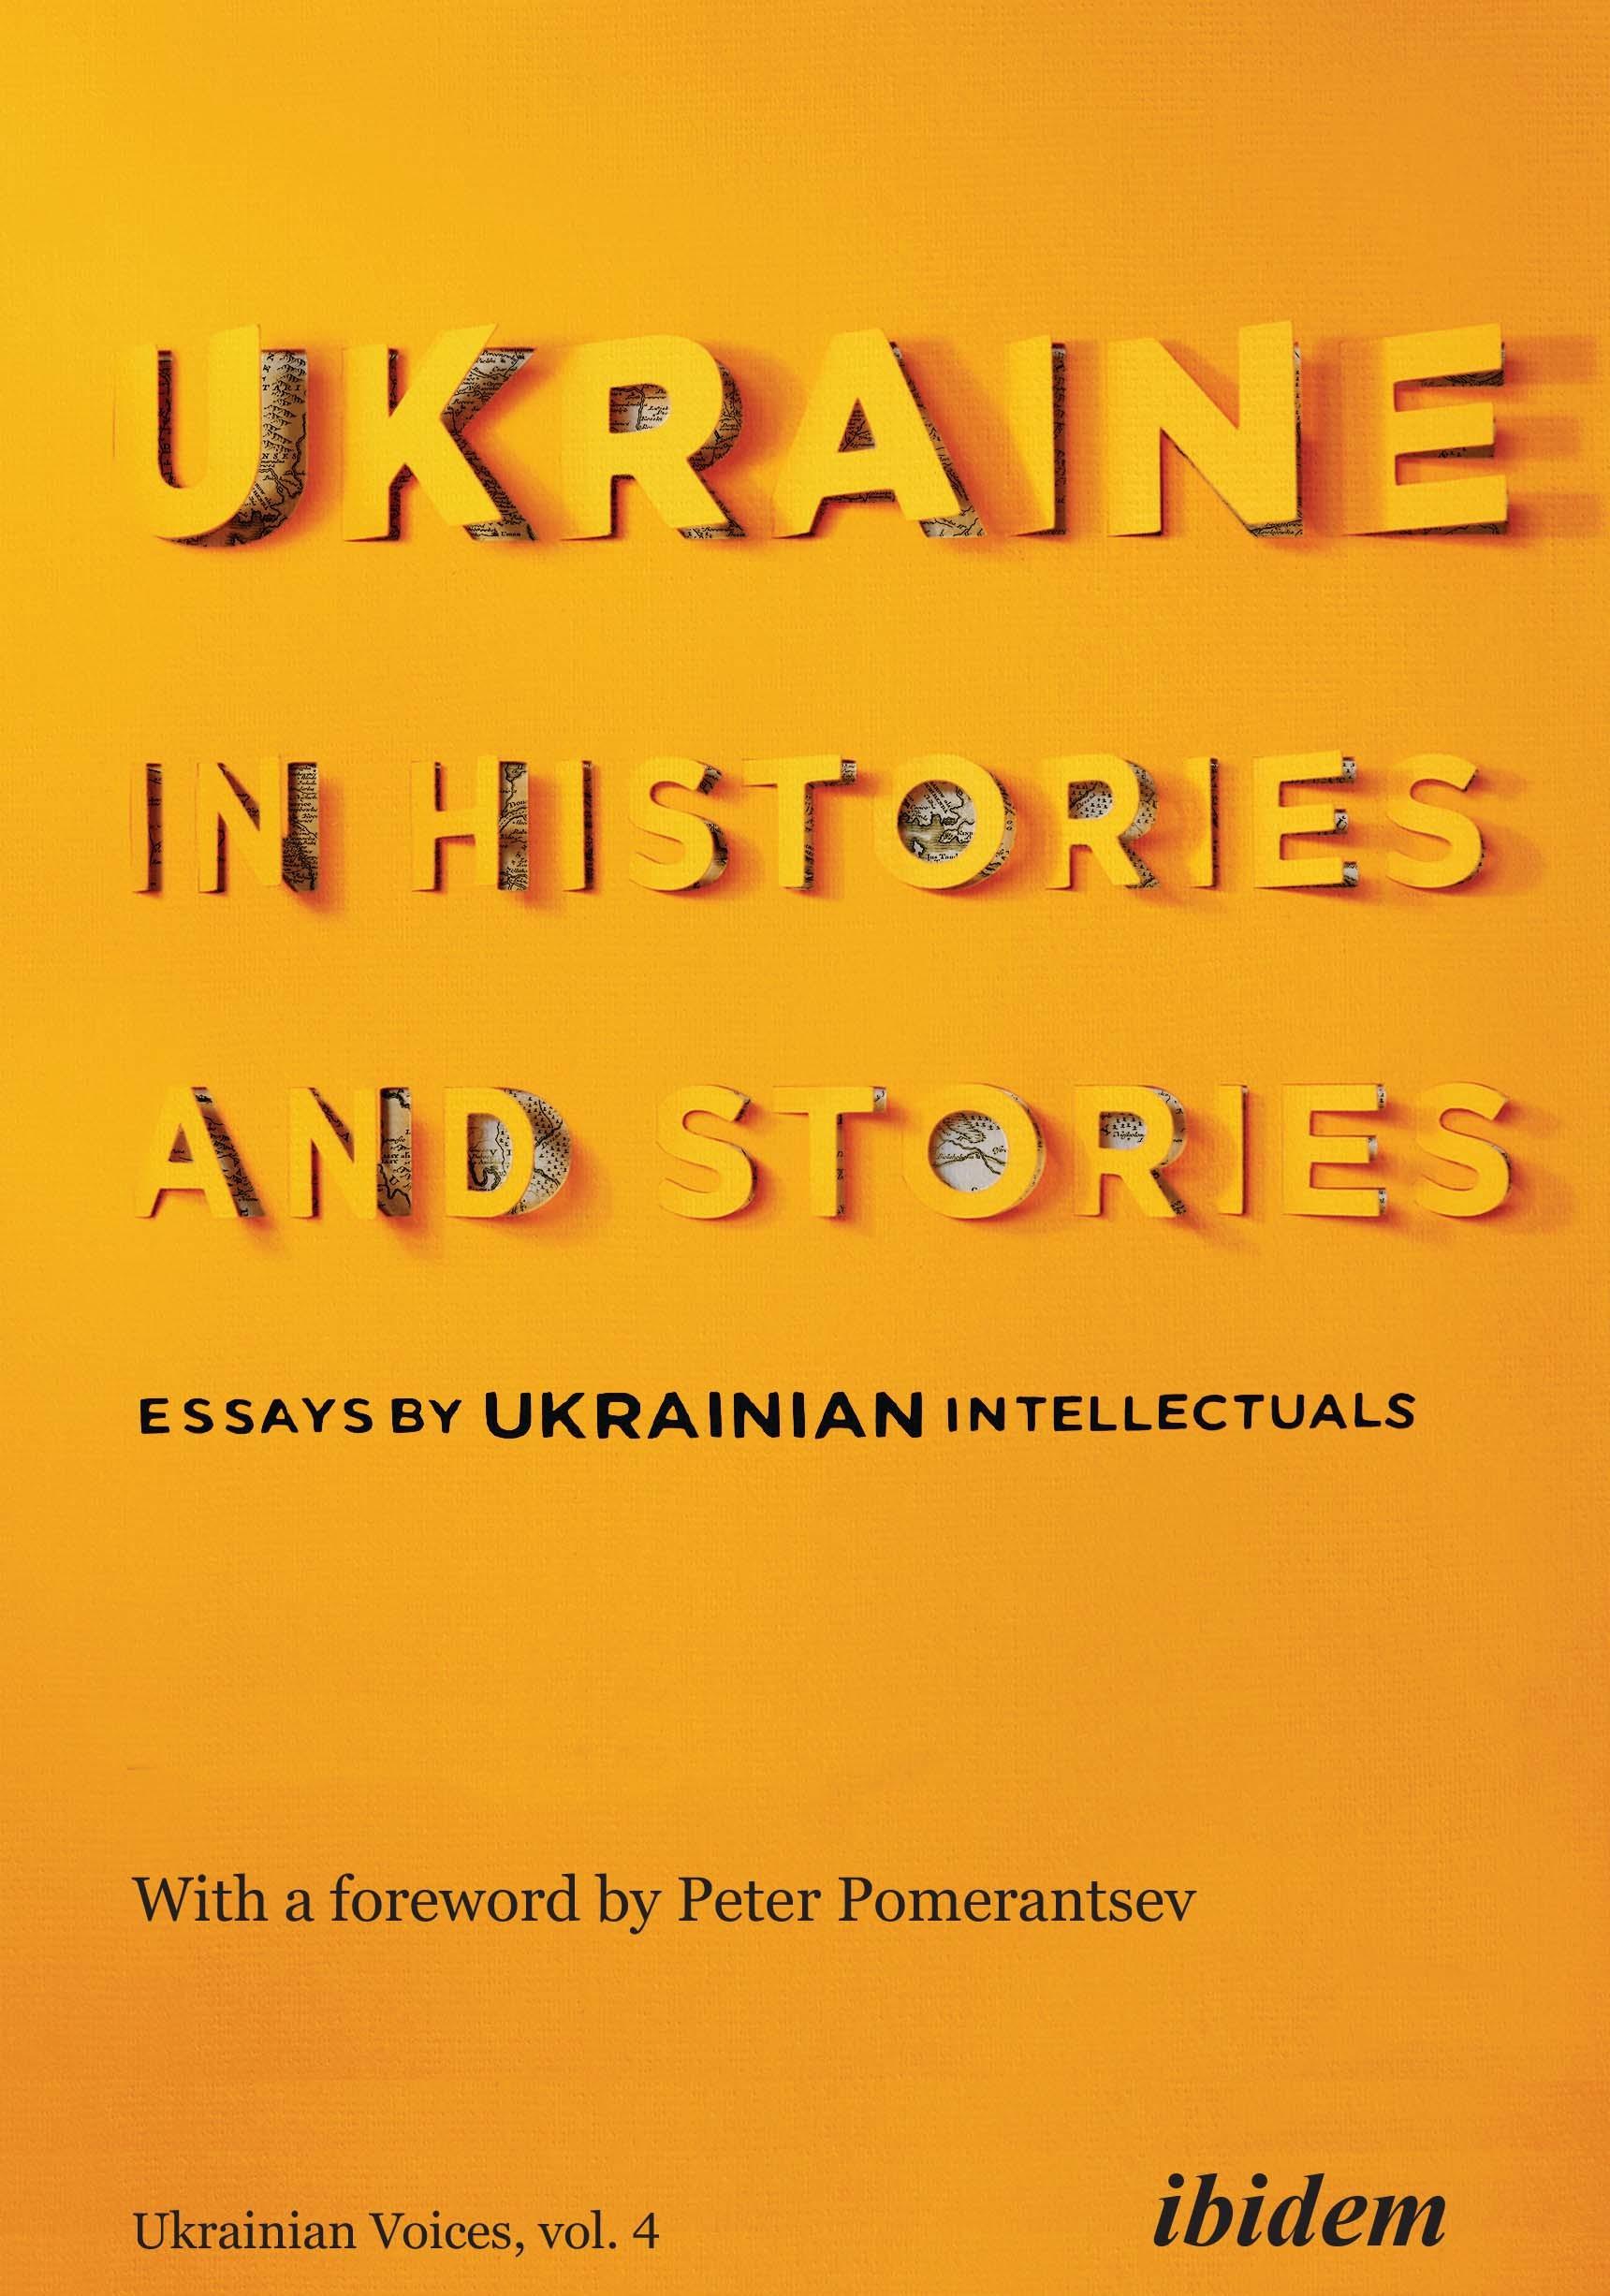 Ukraine in Histories and Stories